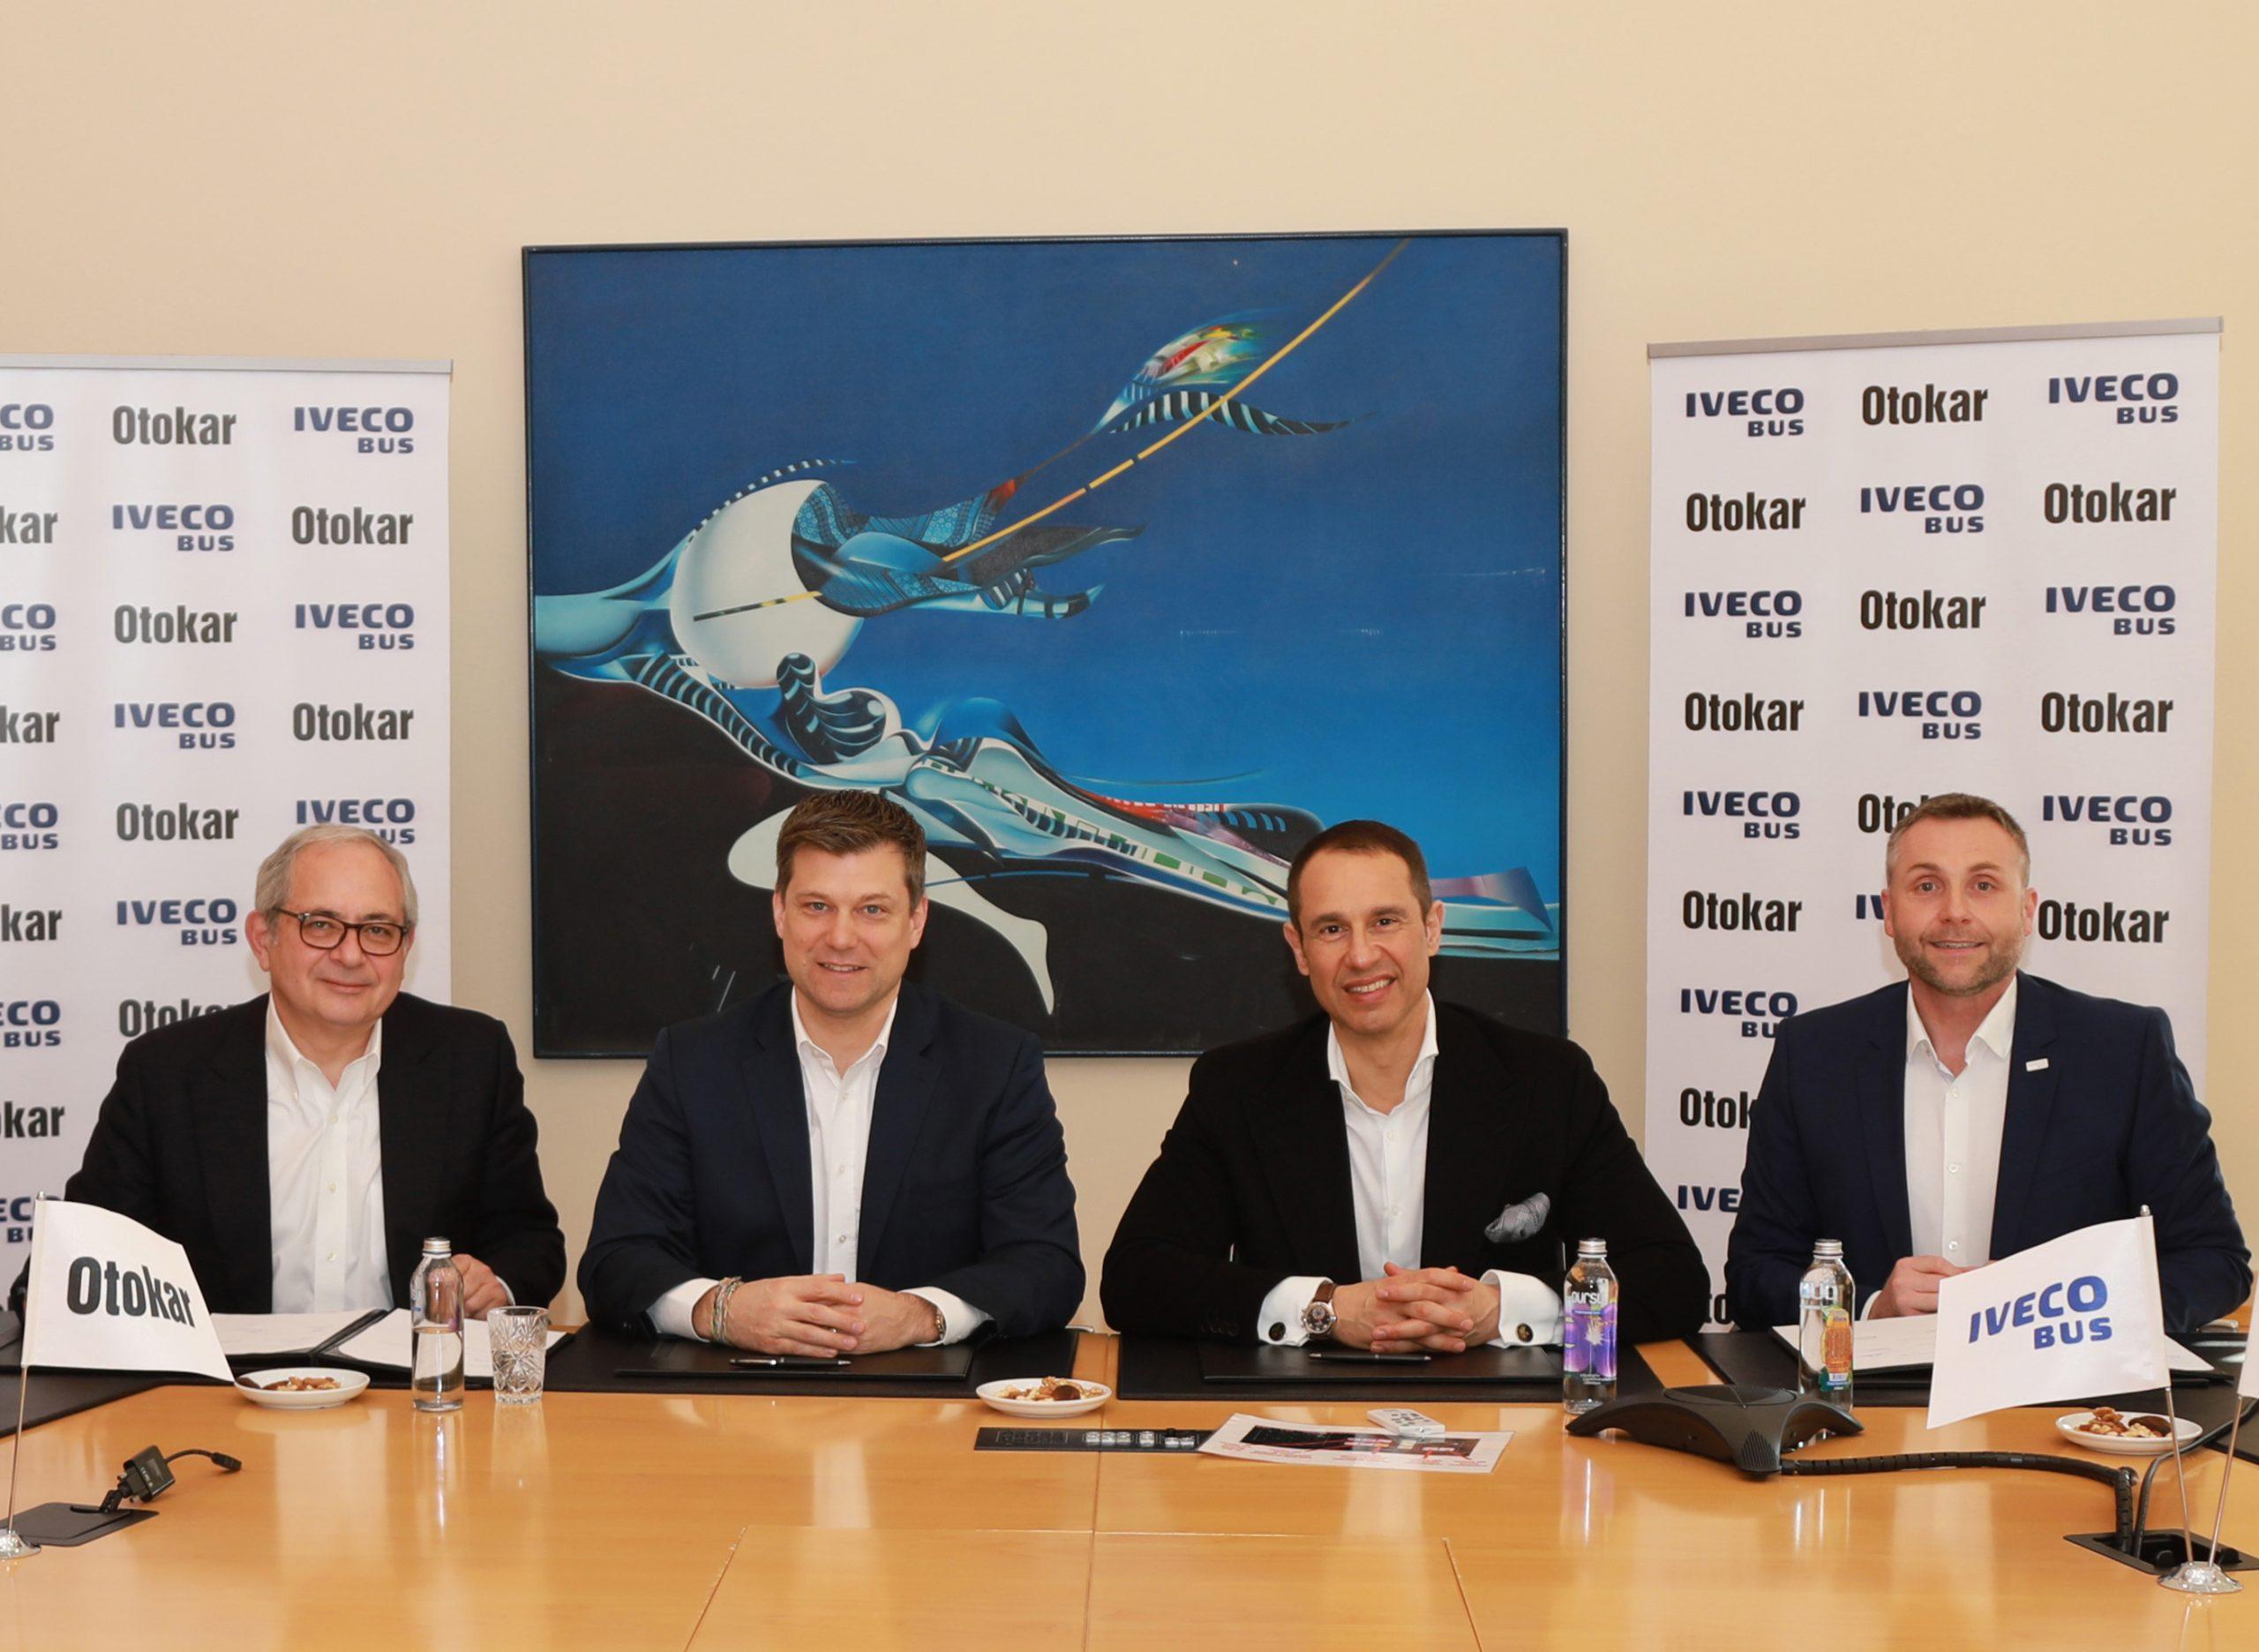 IVECO_BUS_Otokar_contractual_partnership-scaled